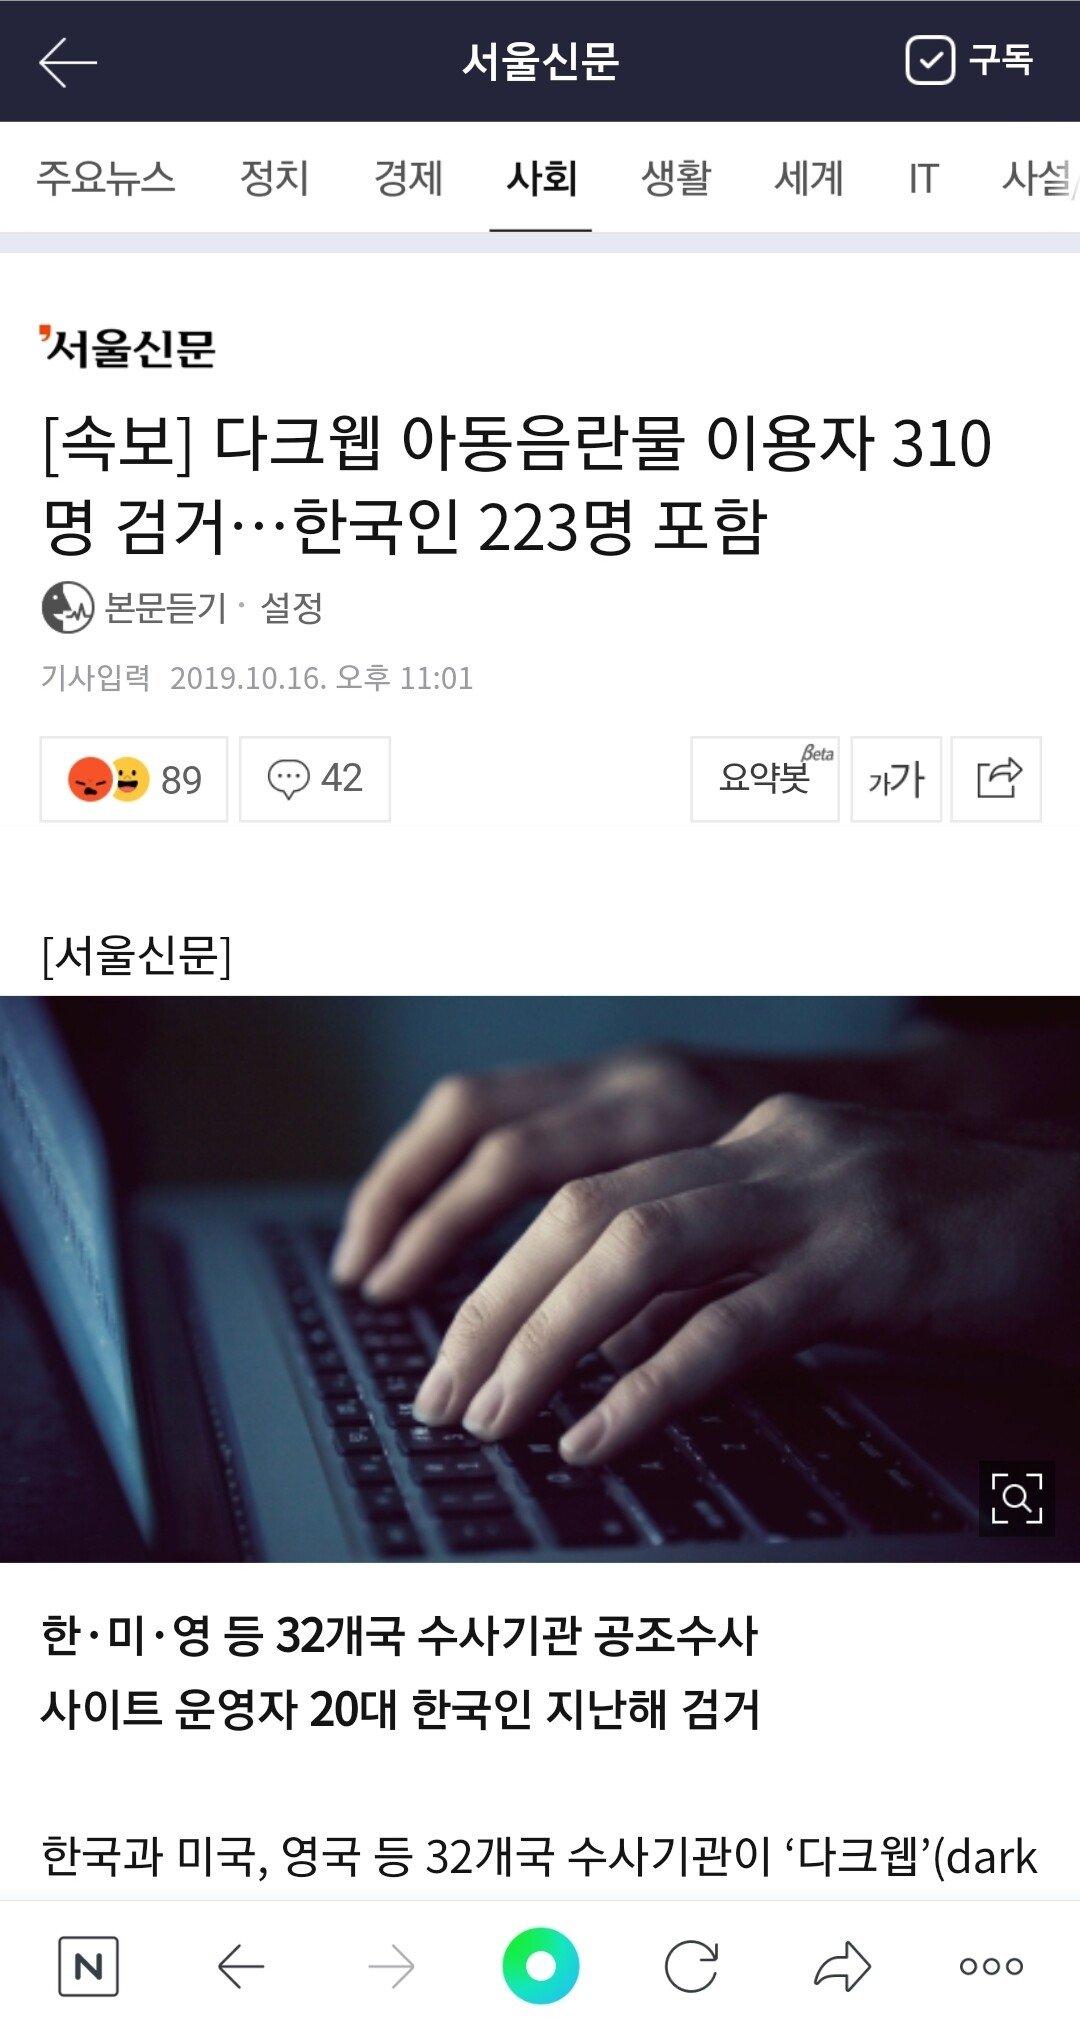 Screenshot_20191016-230620_NAVER.jpg [속보] 다크웹 아동음란물 이용자 310명 검거, 한국인 223명